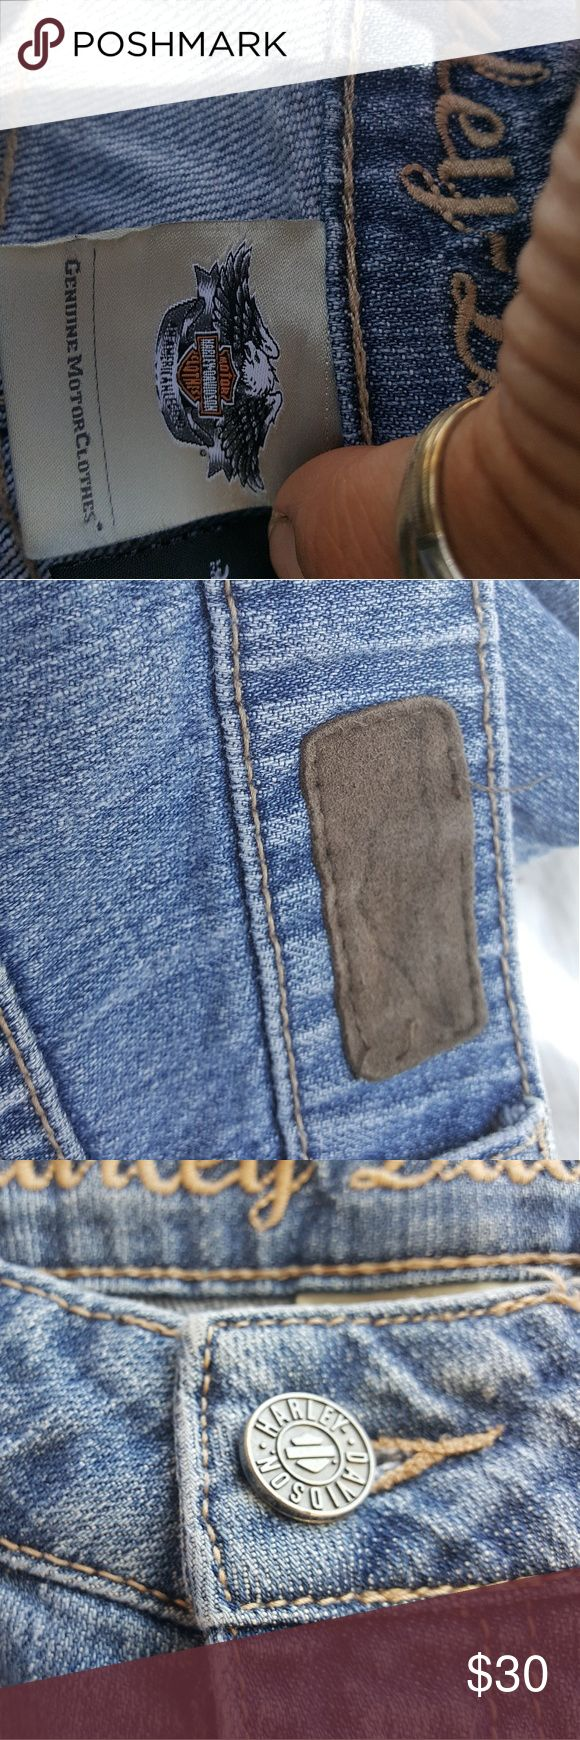 Harley Davidson jeans Worn a few times Harley-Davidson Jeans Boot Cut